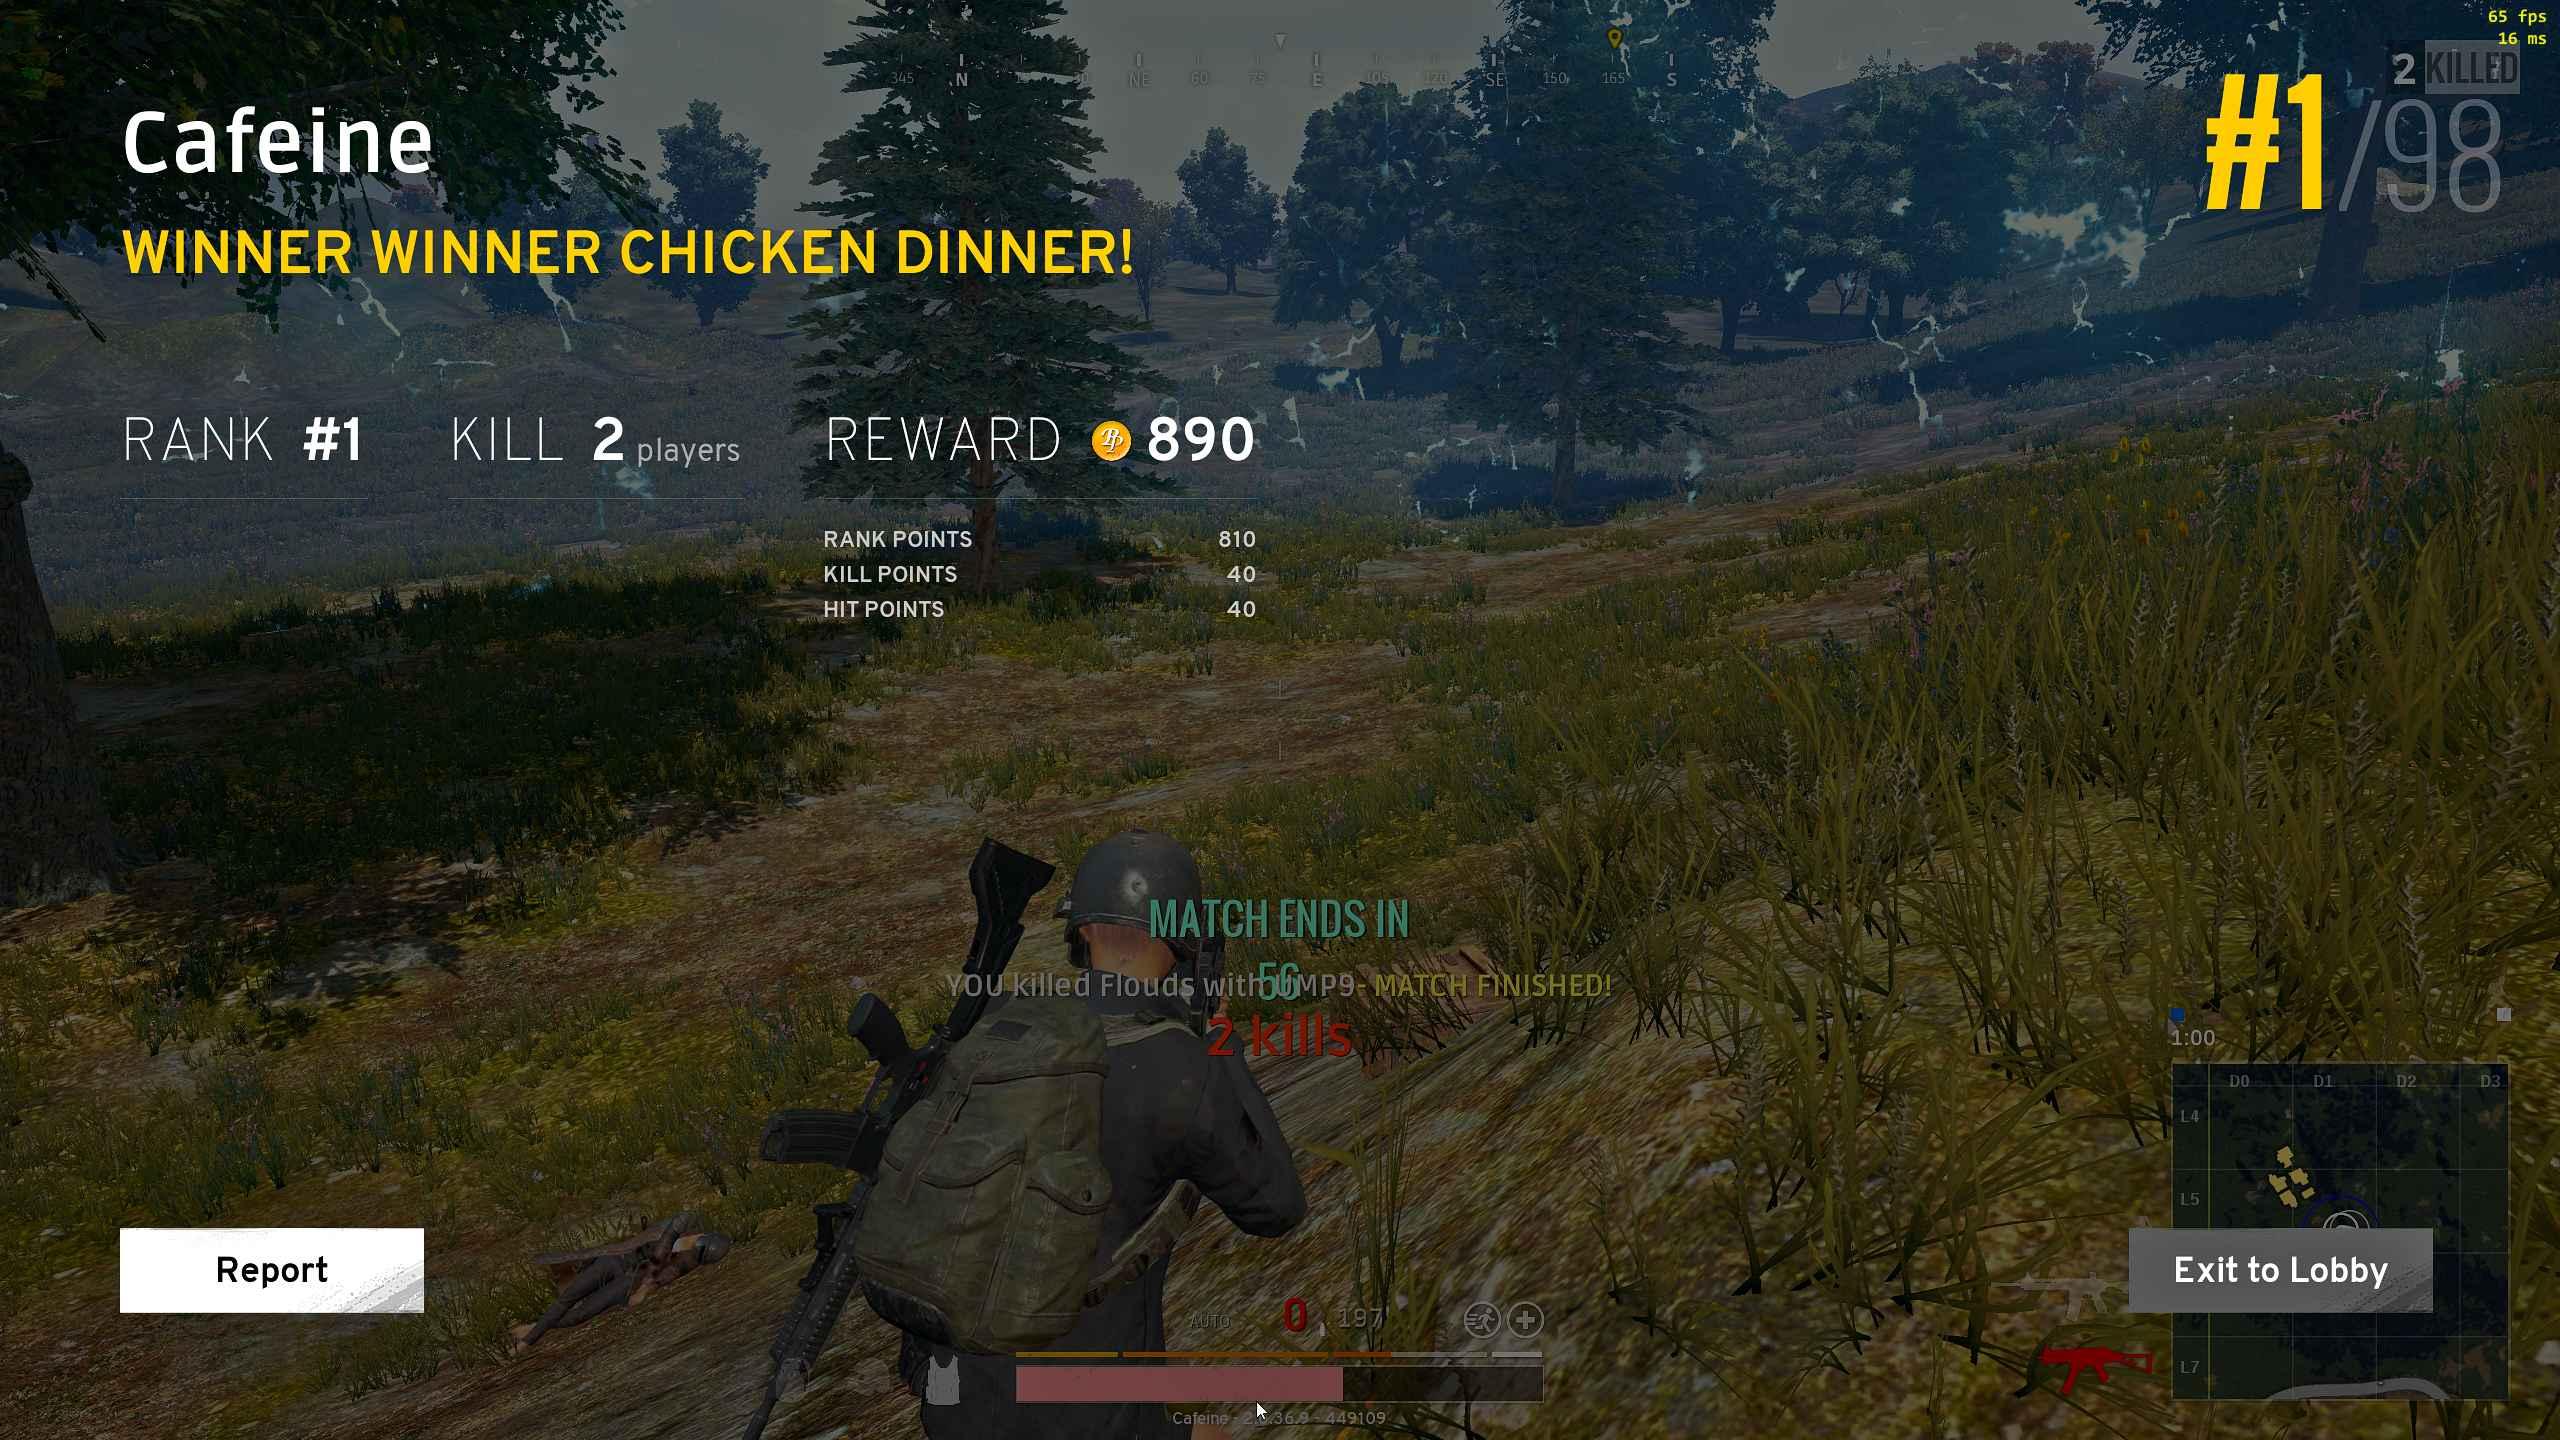 Friday Chicken